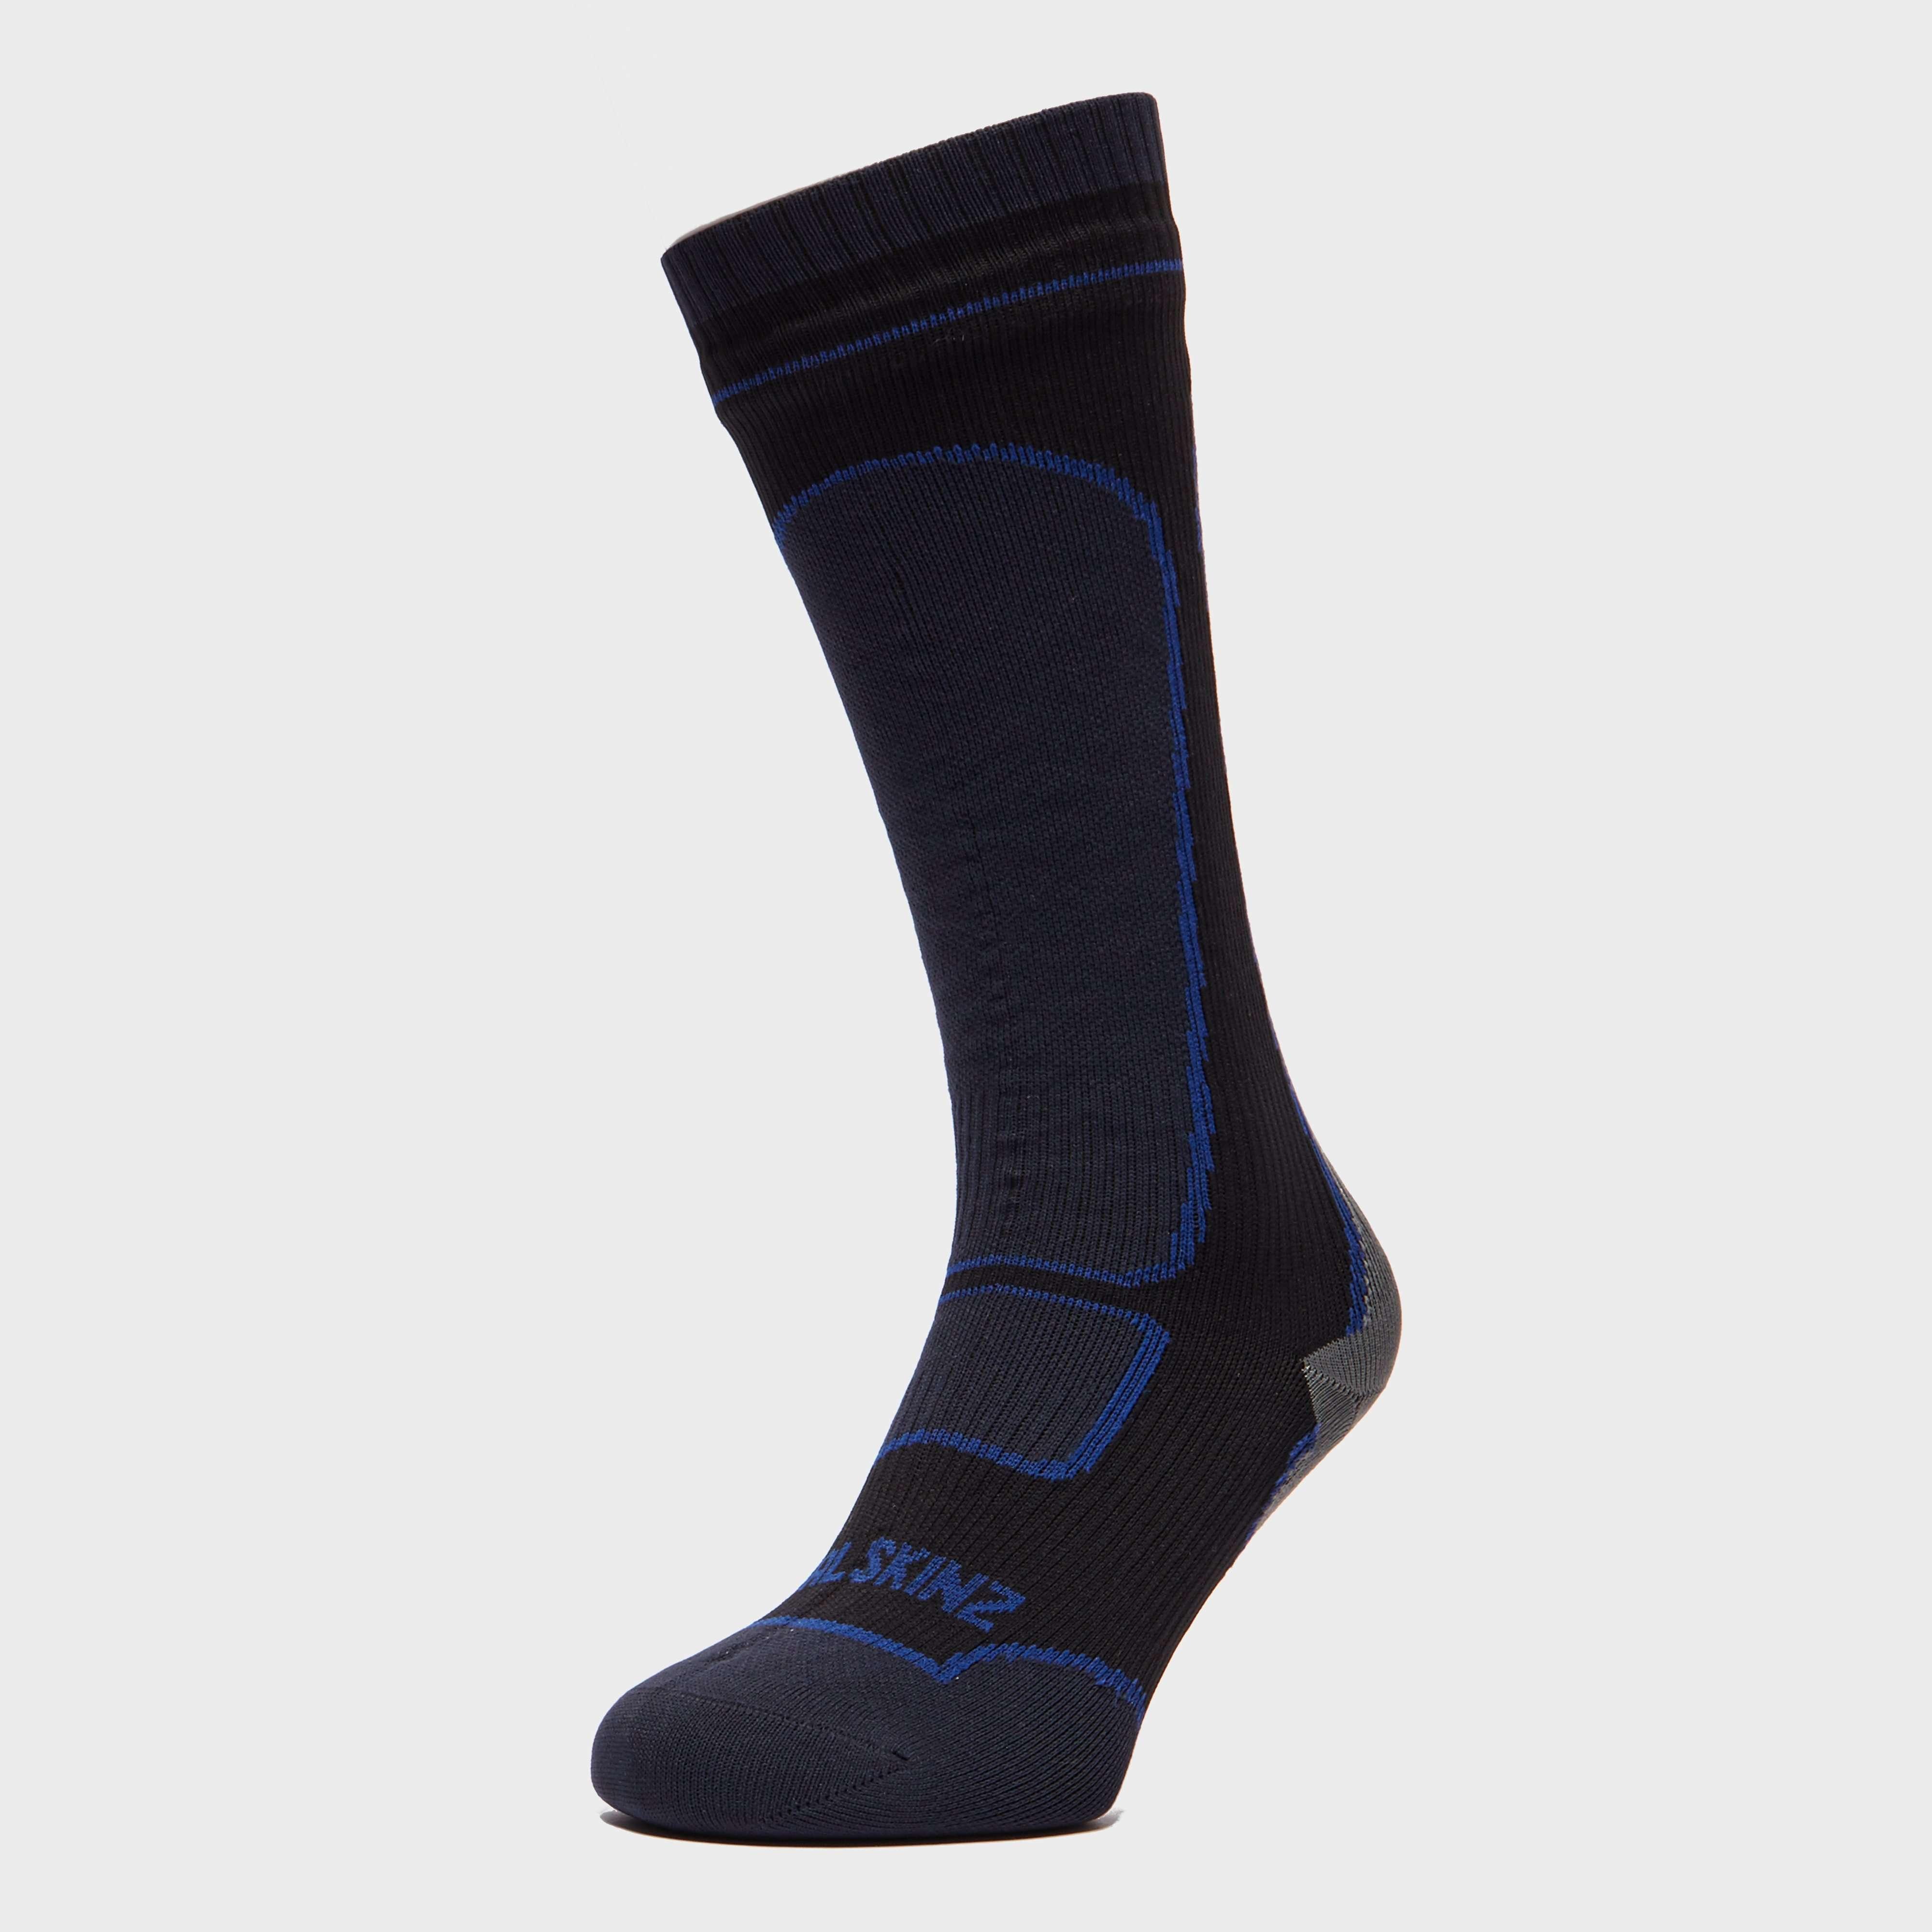 SEALSKINZ Men's Mid-weight Knee Length Socks